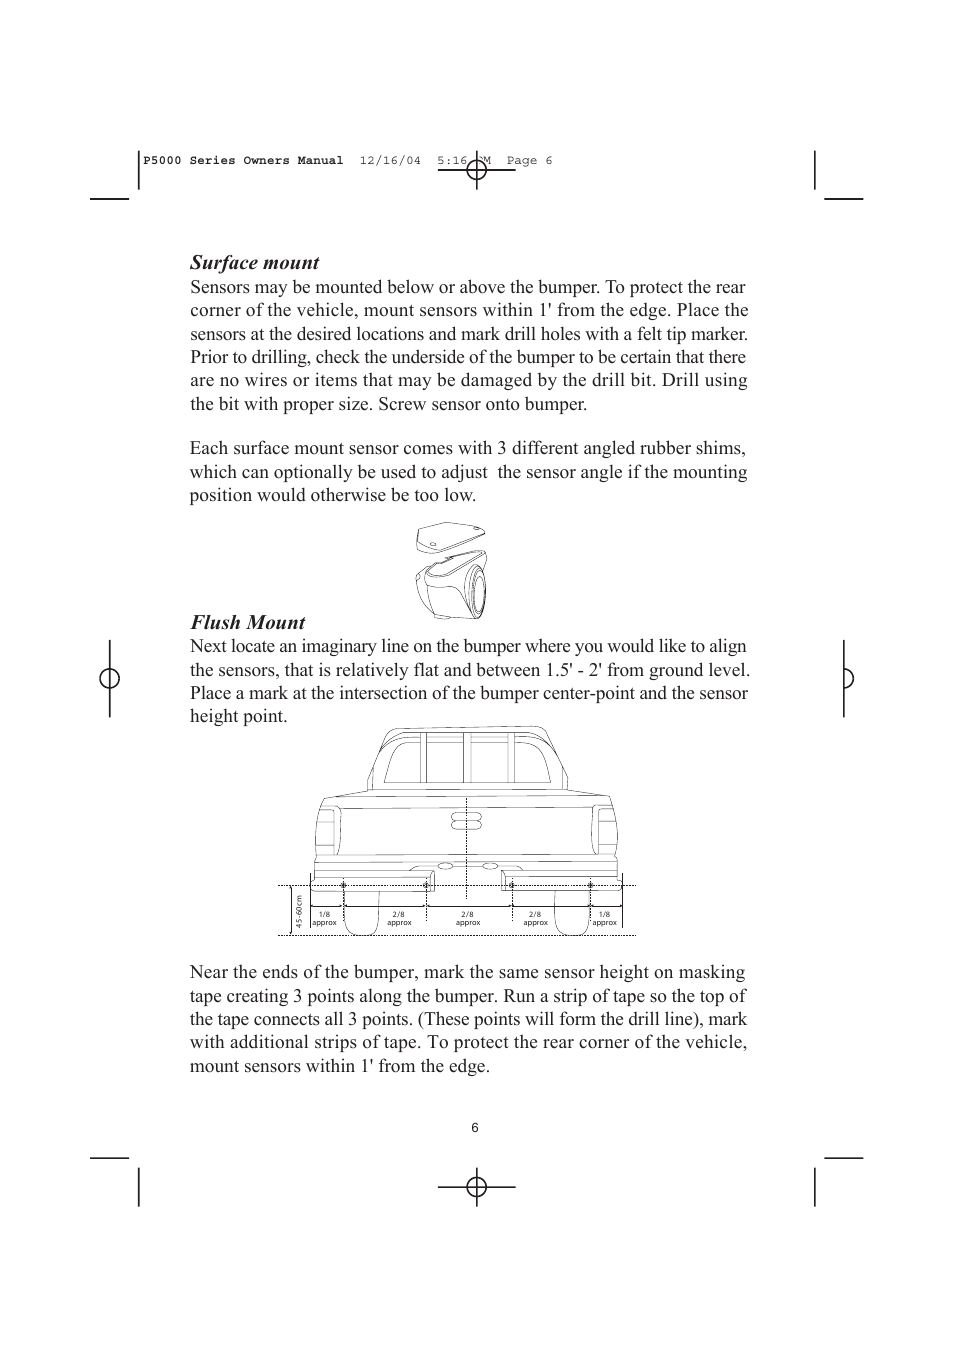 ... Array - flush mount surface mount ackton p5000 user manual page 6 12 rh  manualsdir ...